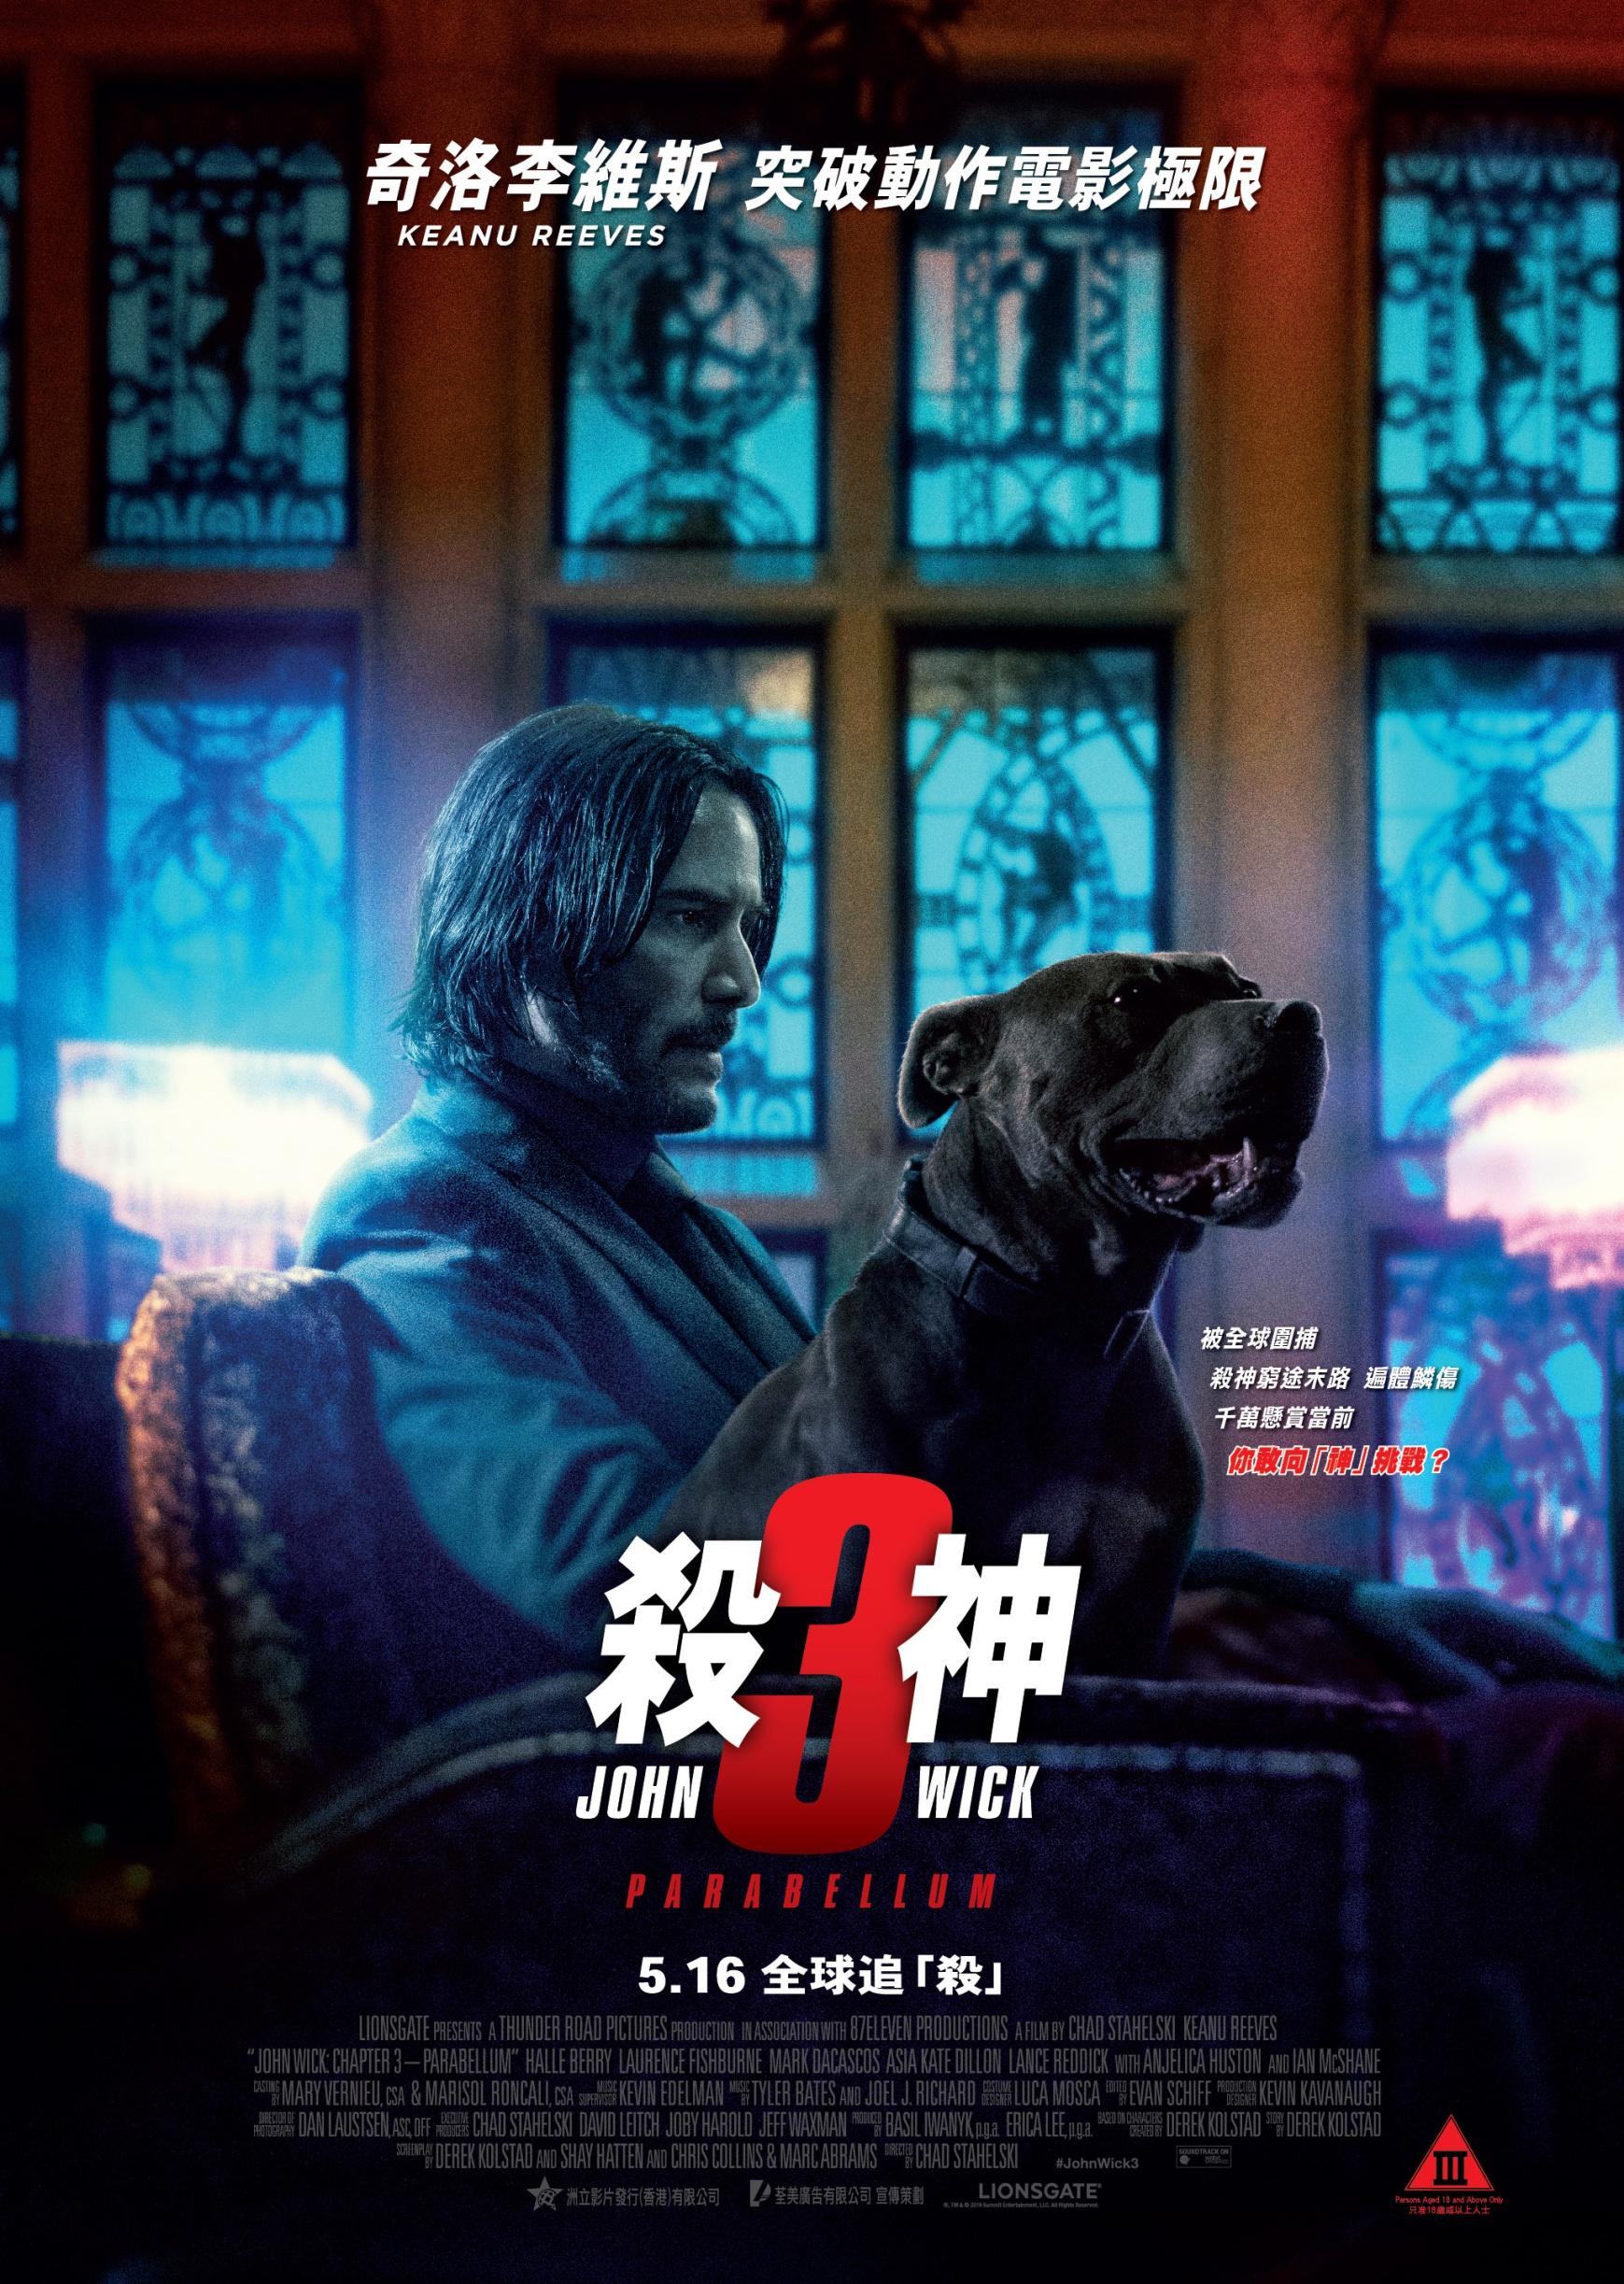 20190421_JohnWick3Parabellum_Poster.jpg